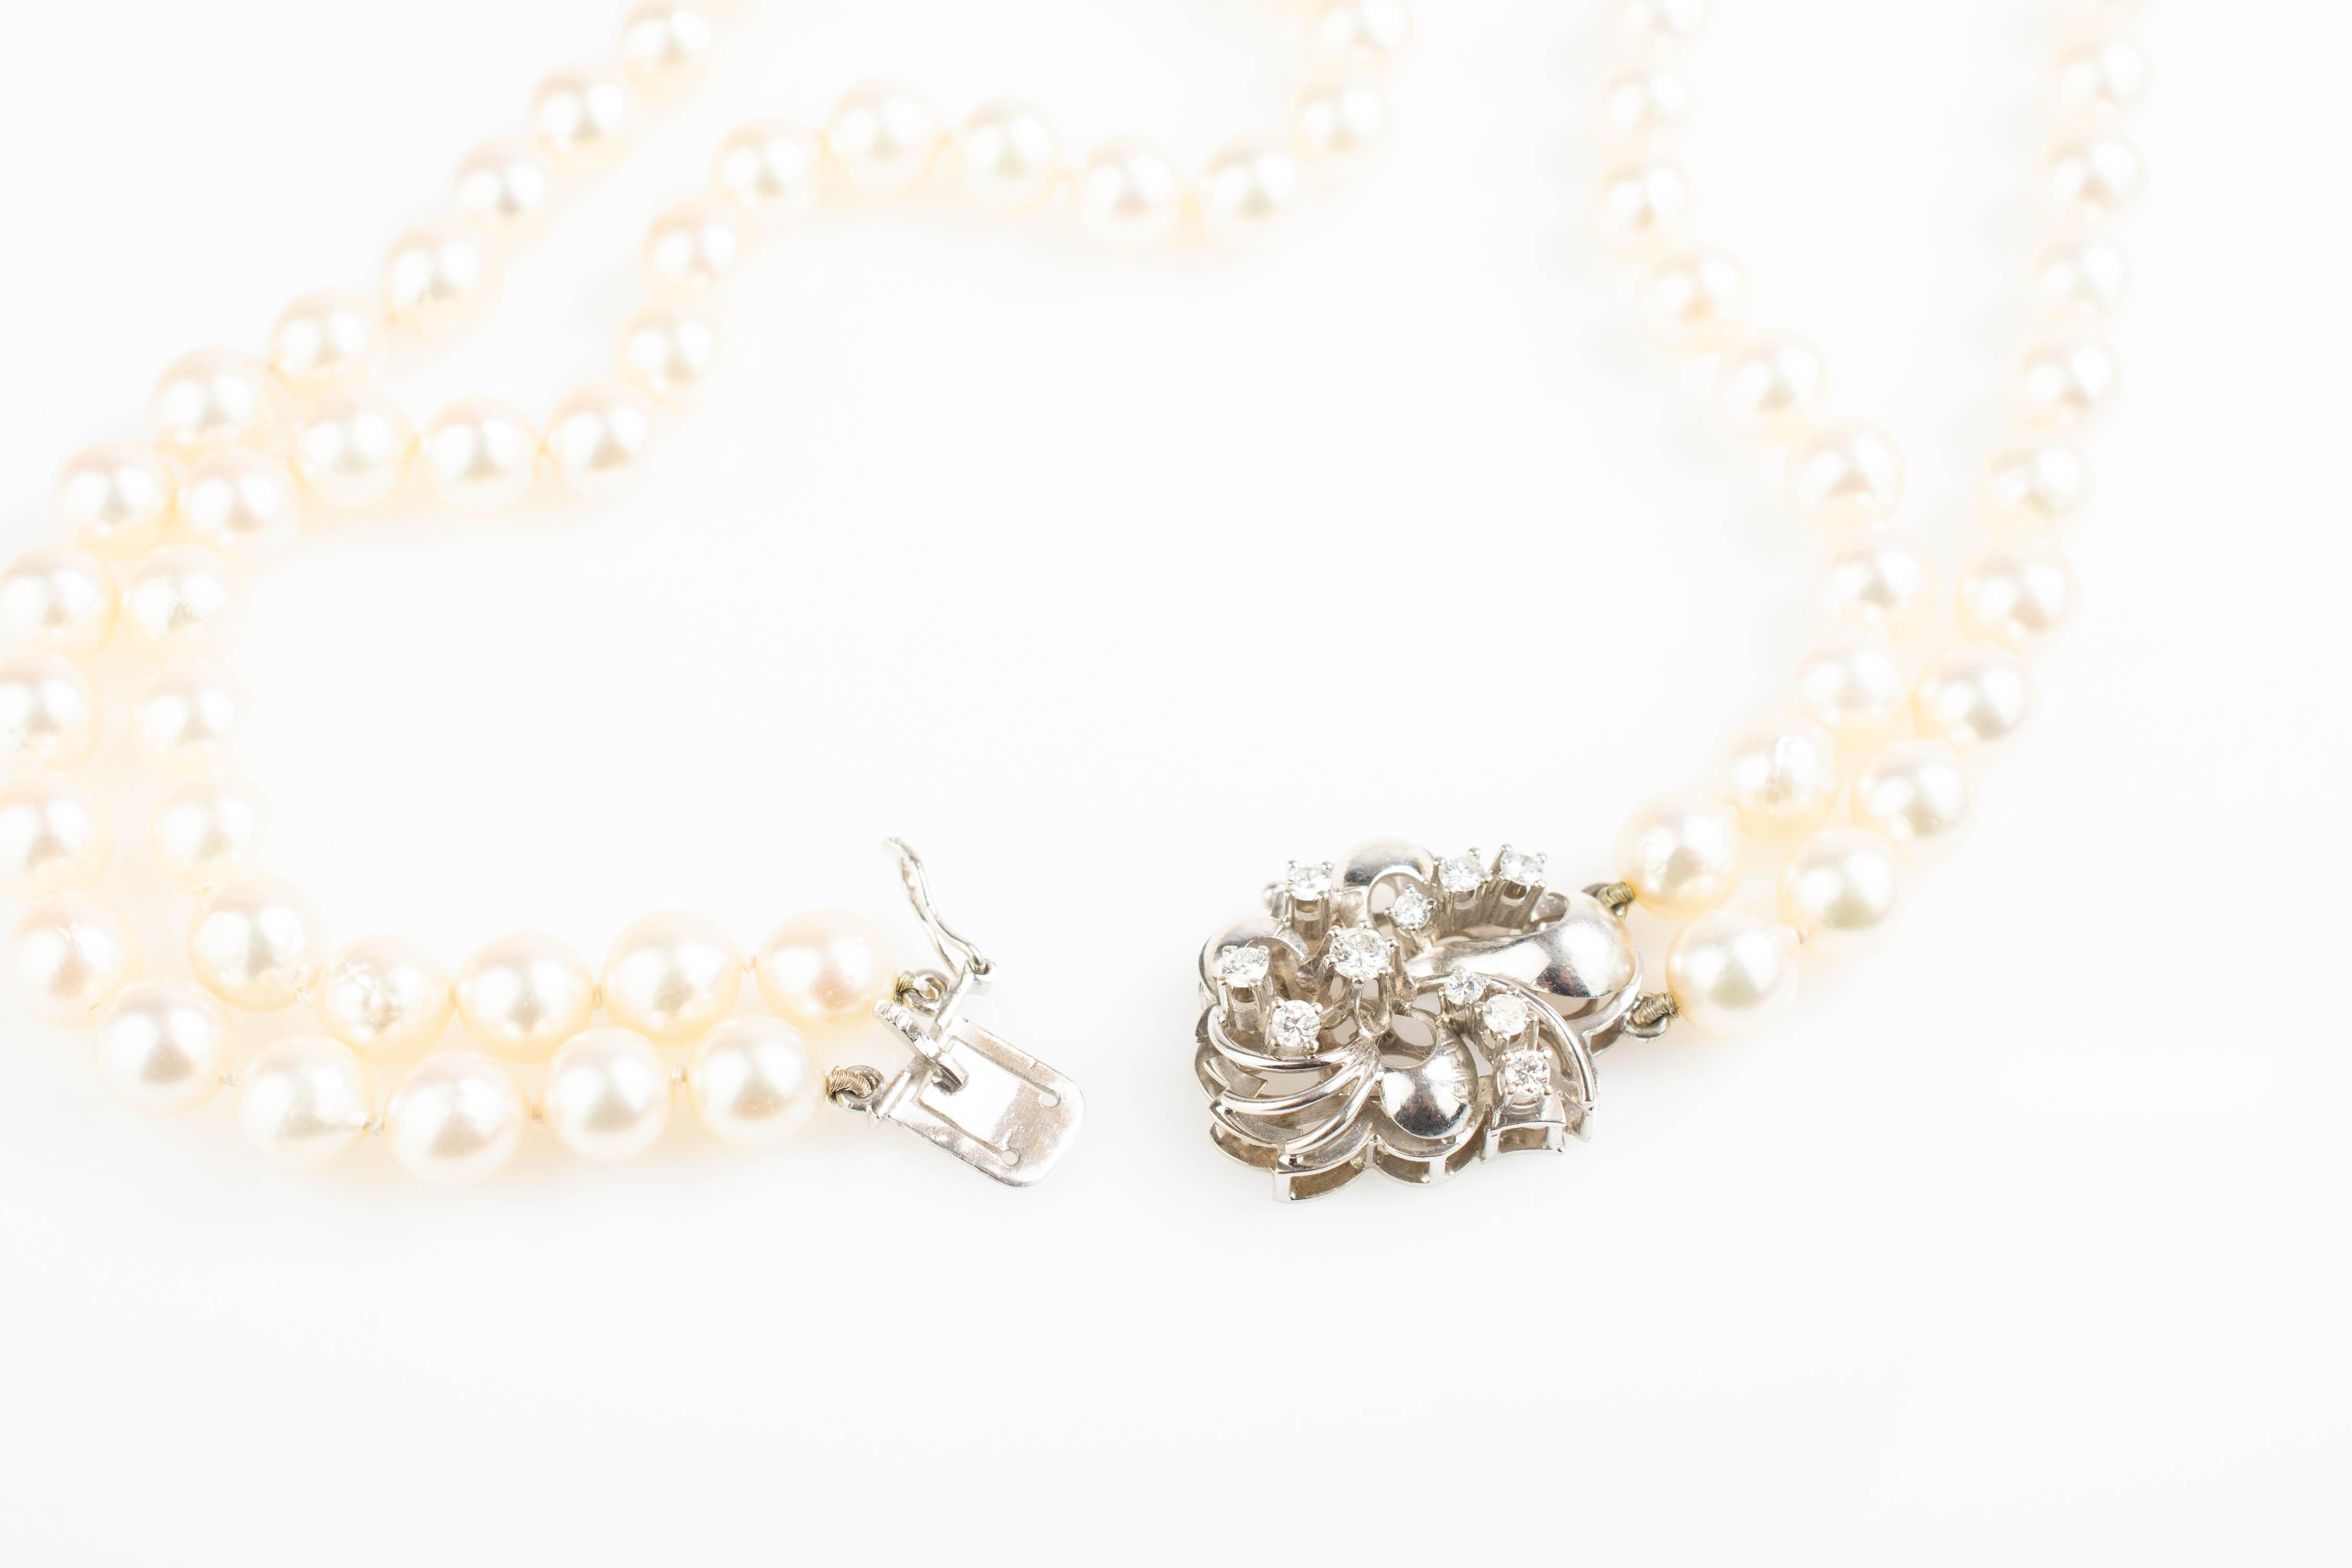 Perlenkette - Image 3 of 3